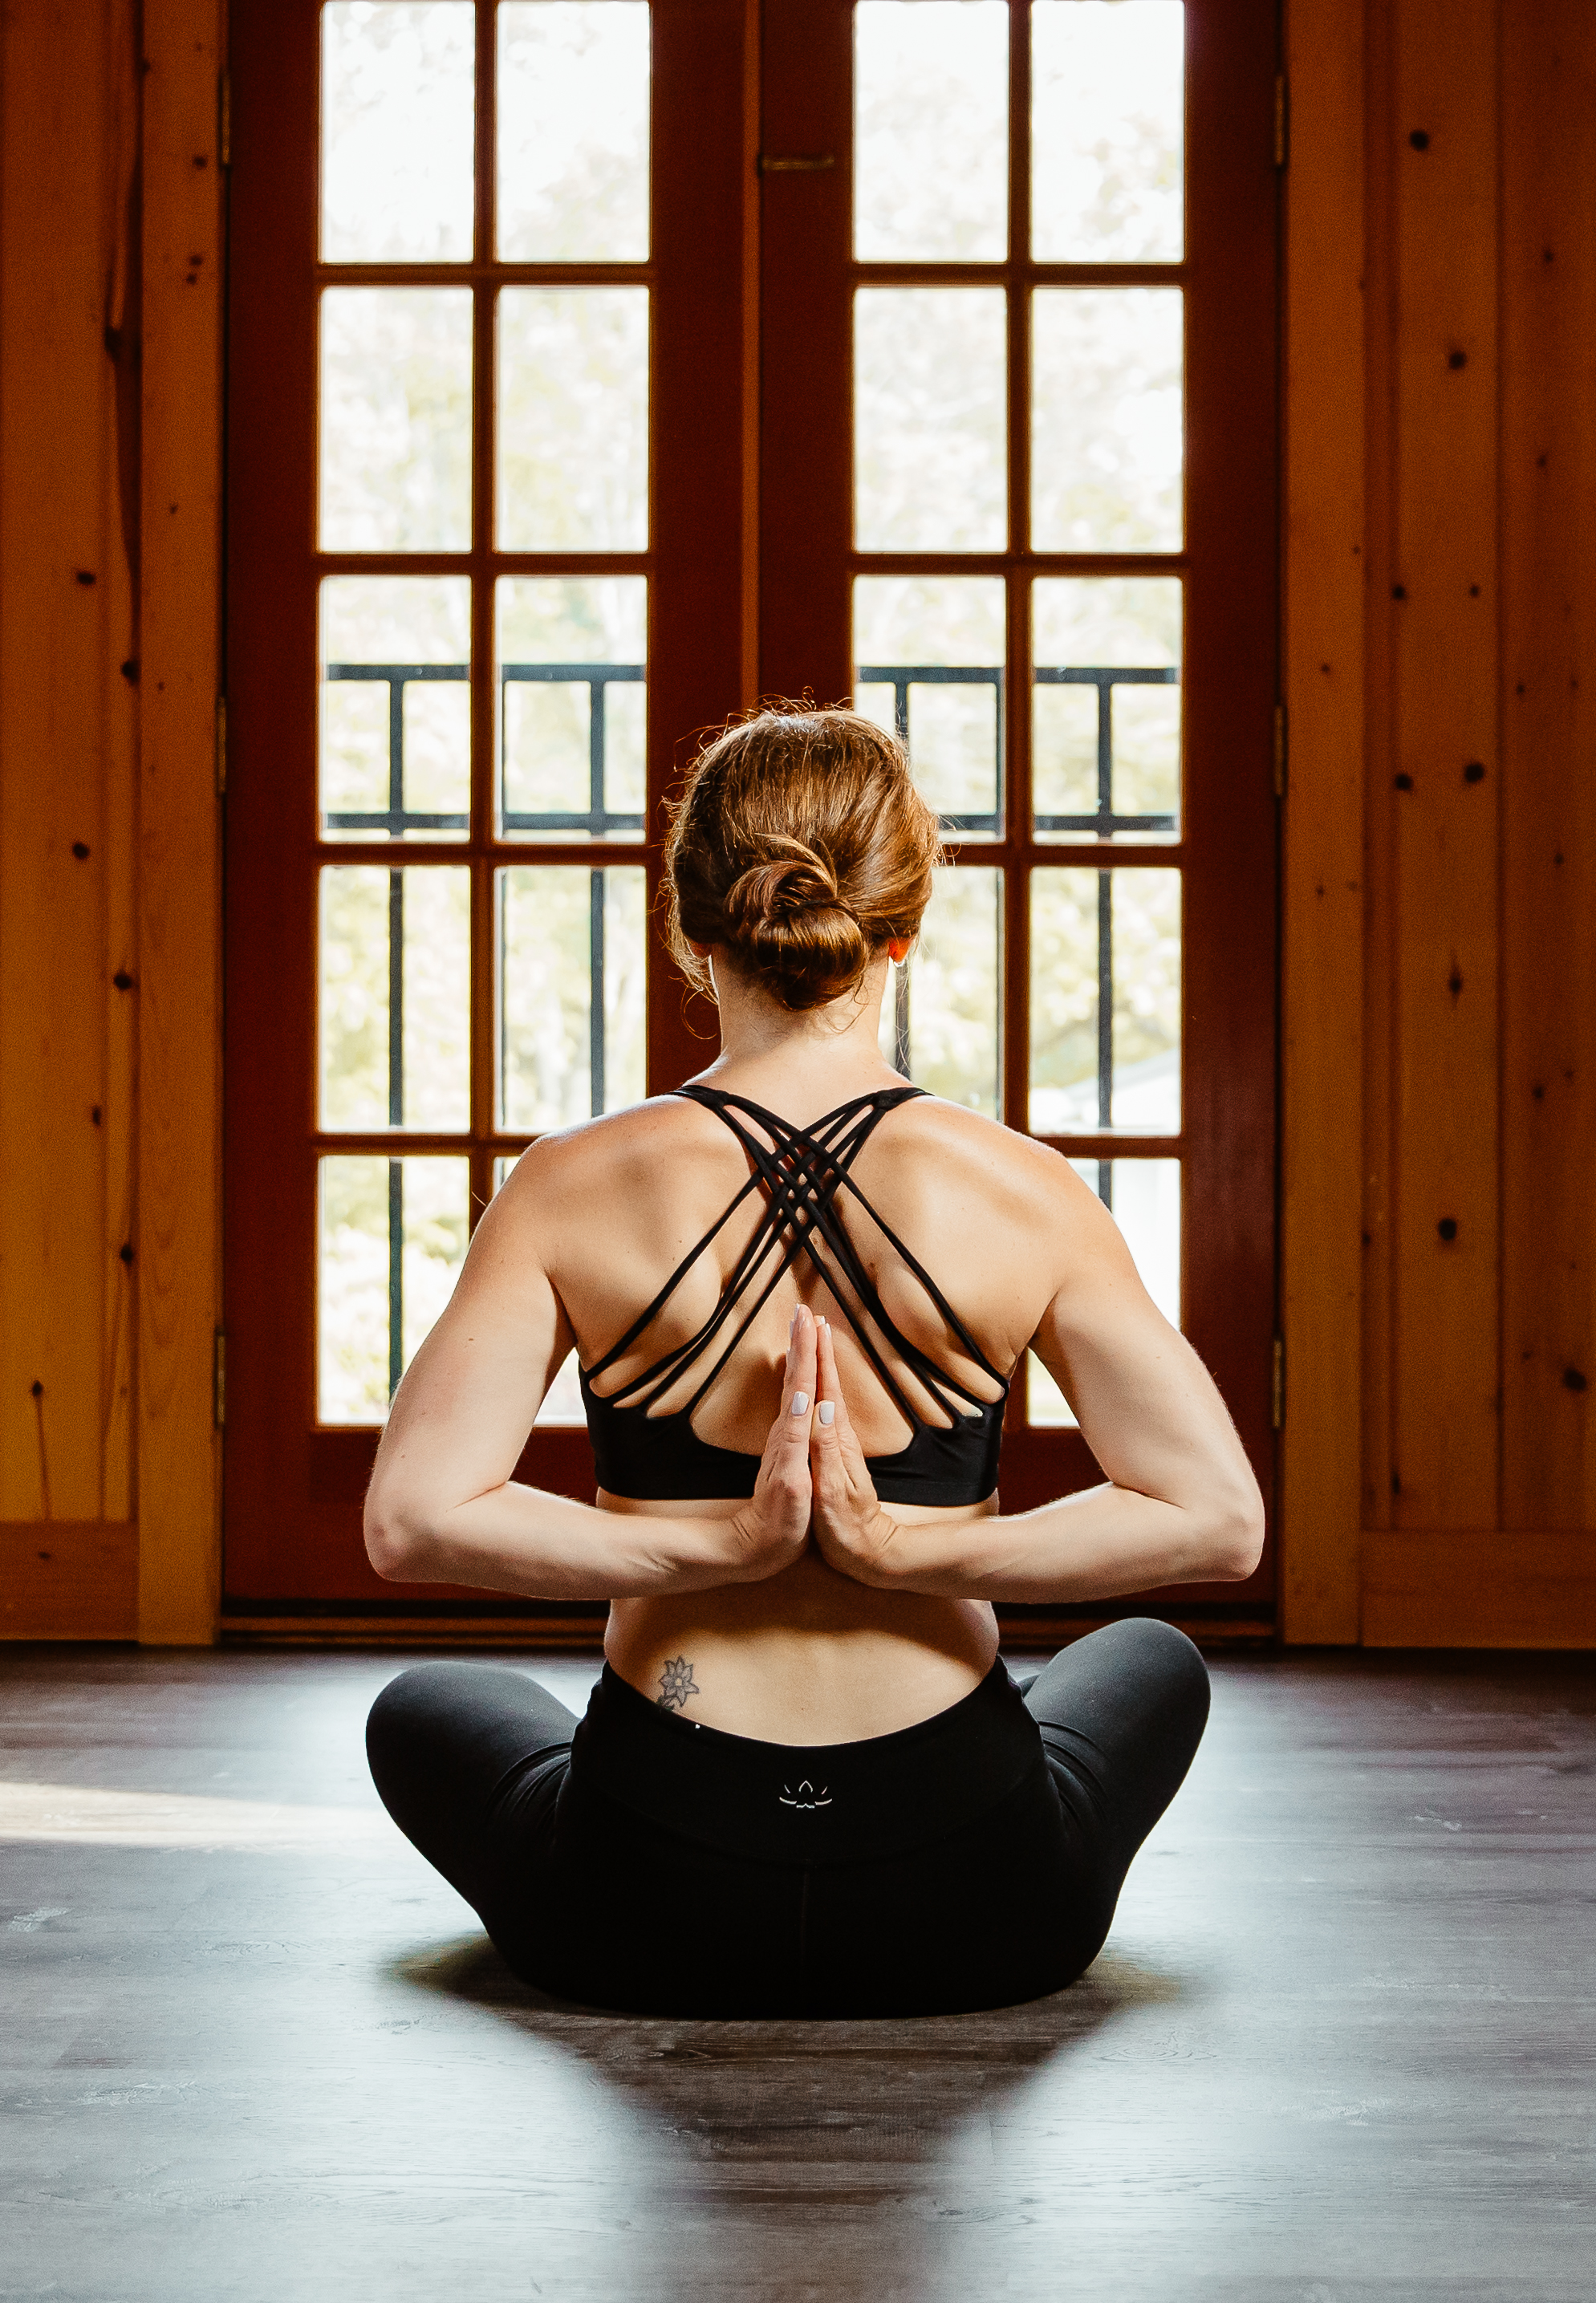 community-yoga-sudbury-boston-commercial-photographer.jpg